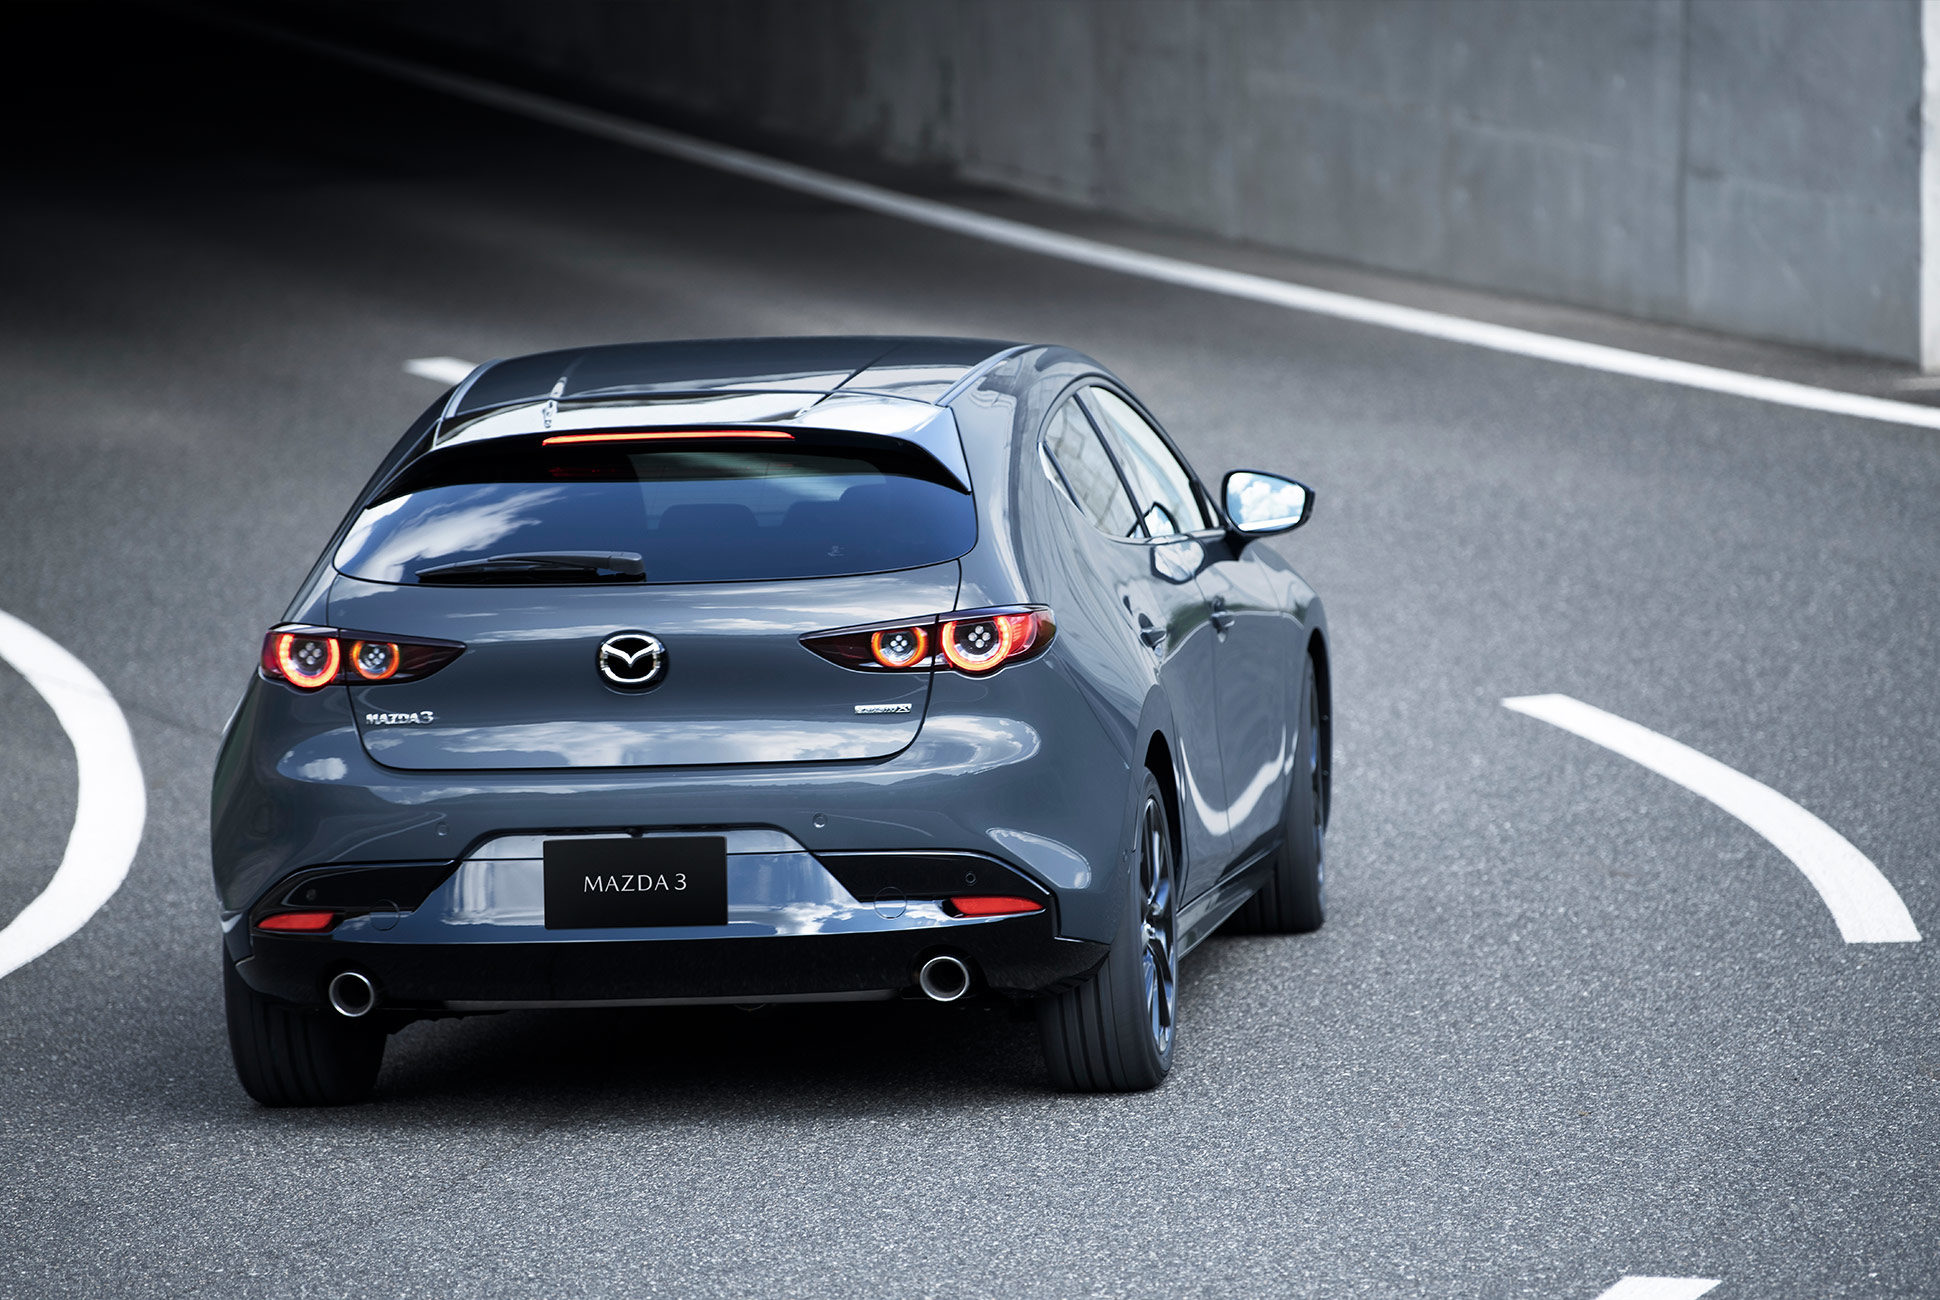 2018 - [Mazda] 3 IV - Page 11 Next-g12